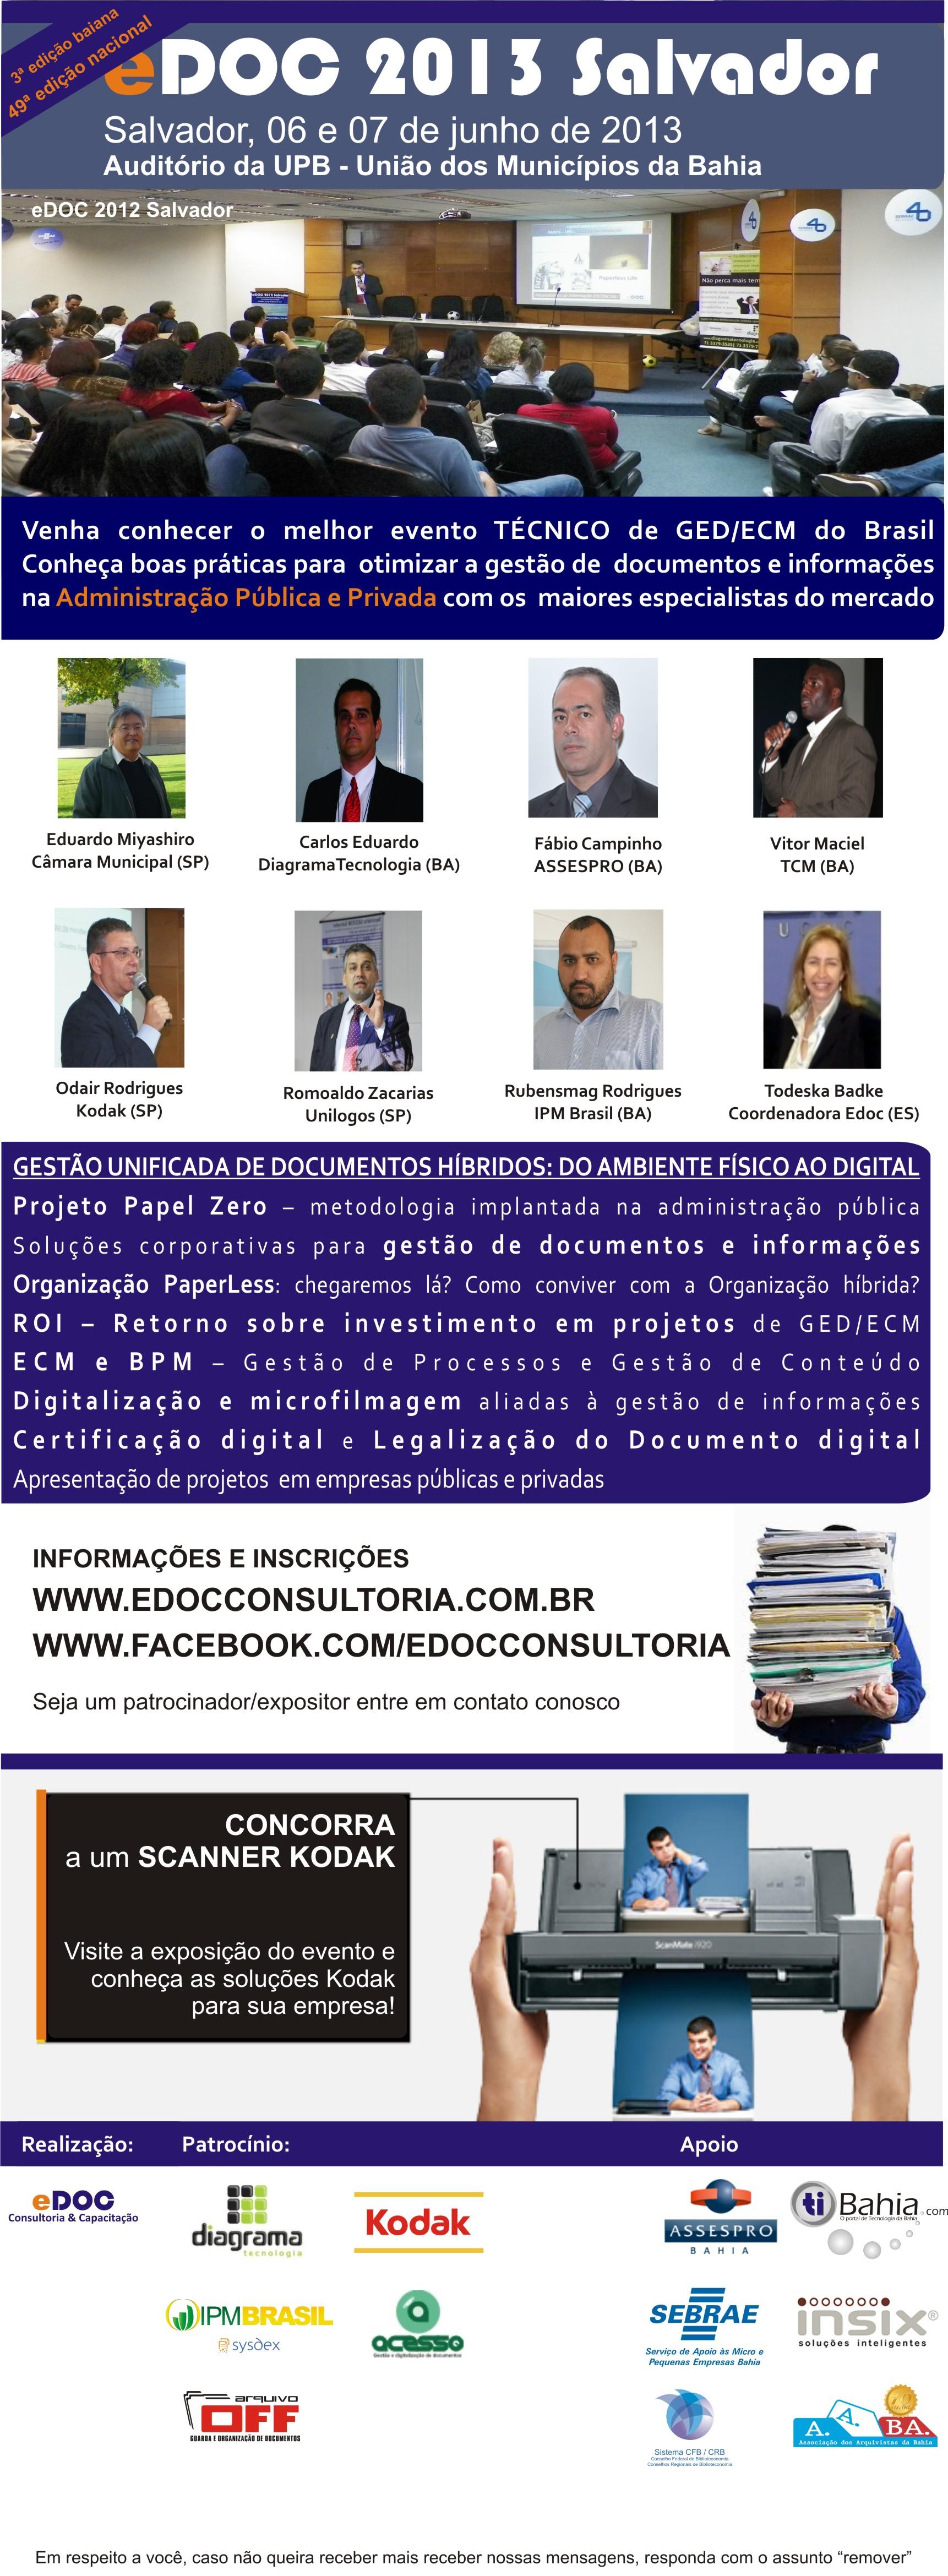 EDOC Salvador